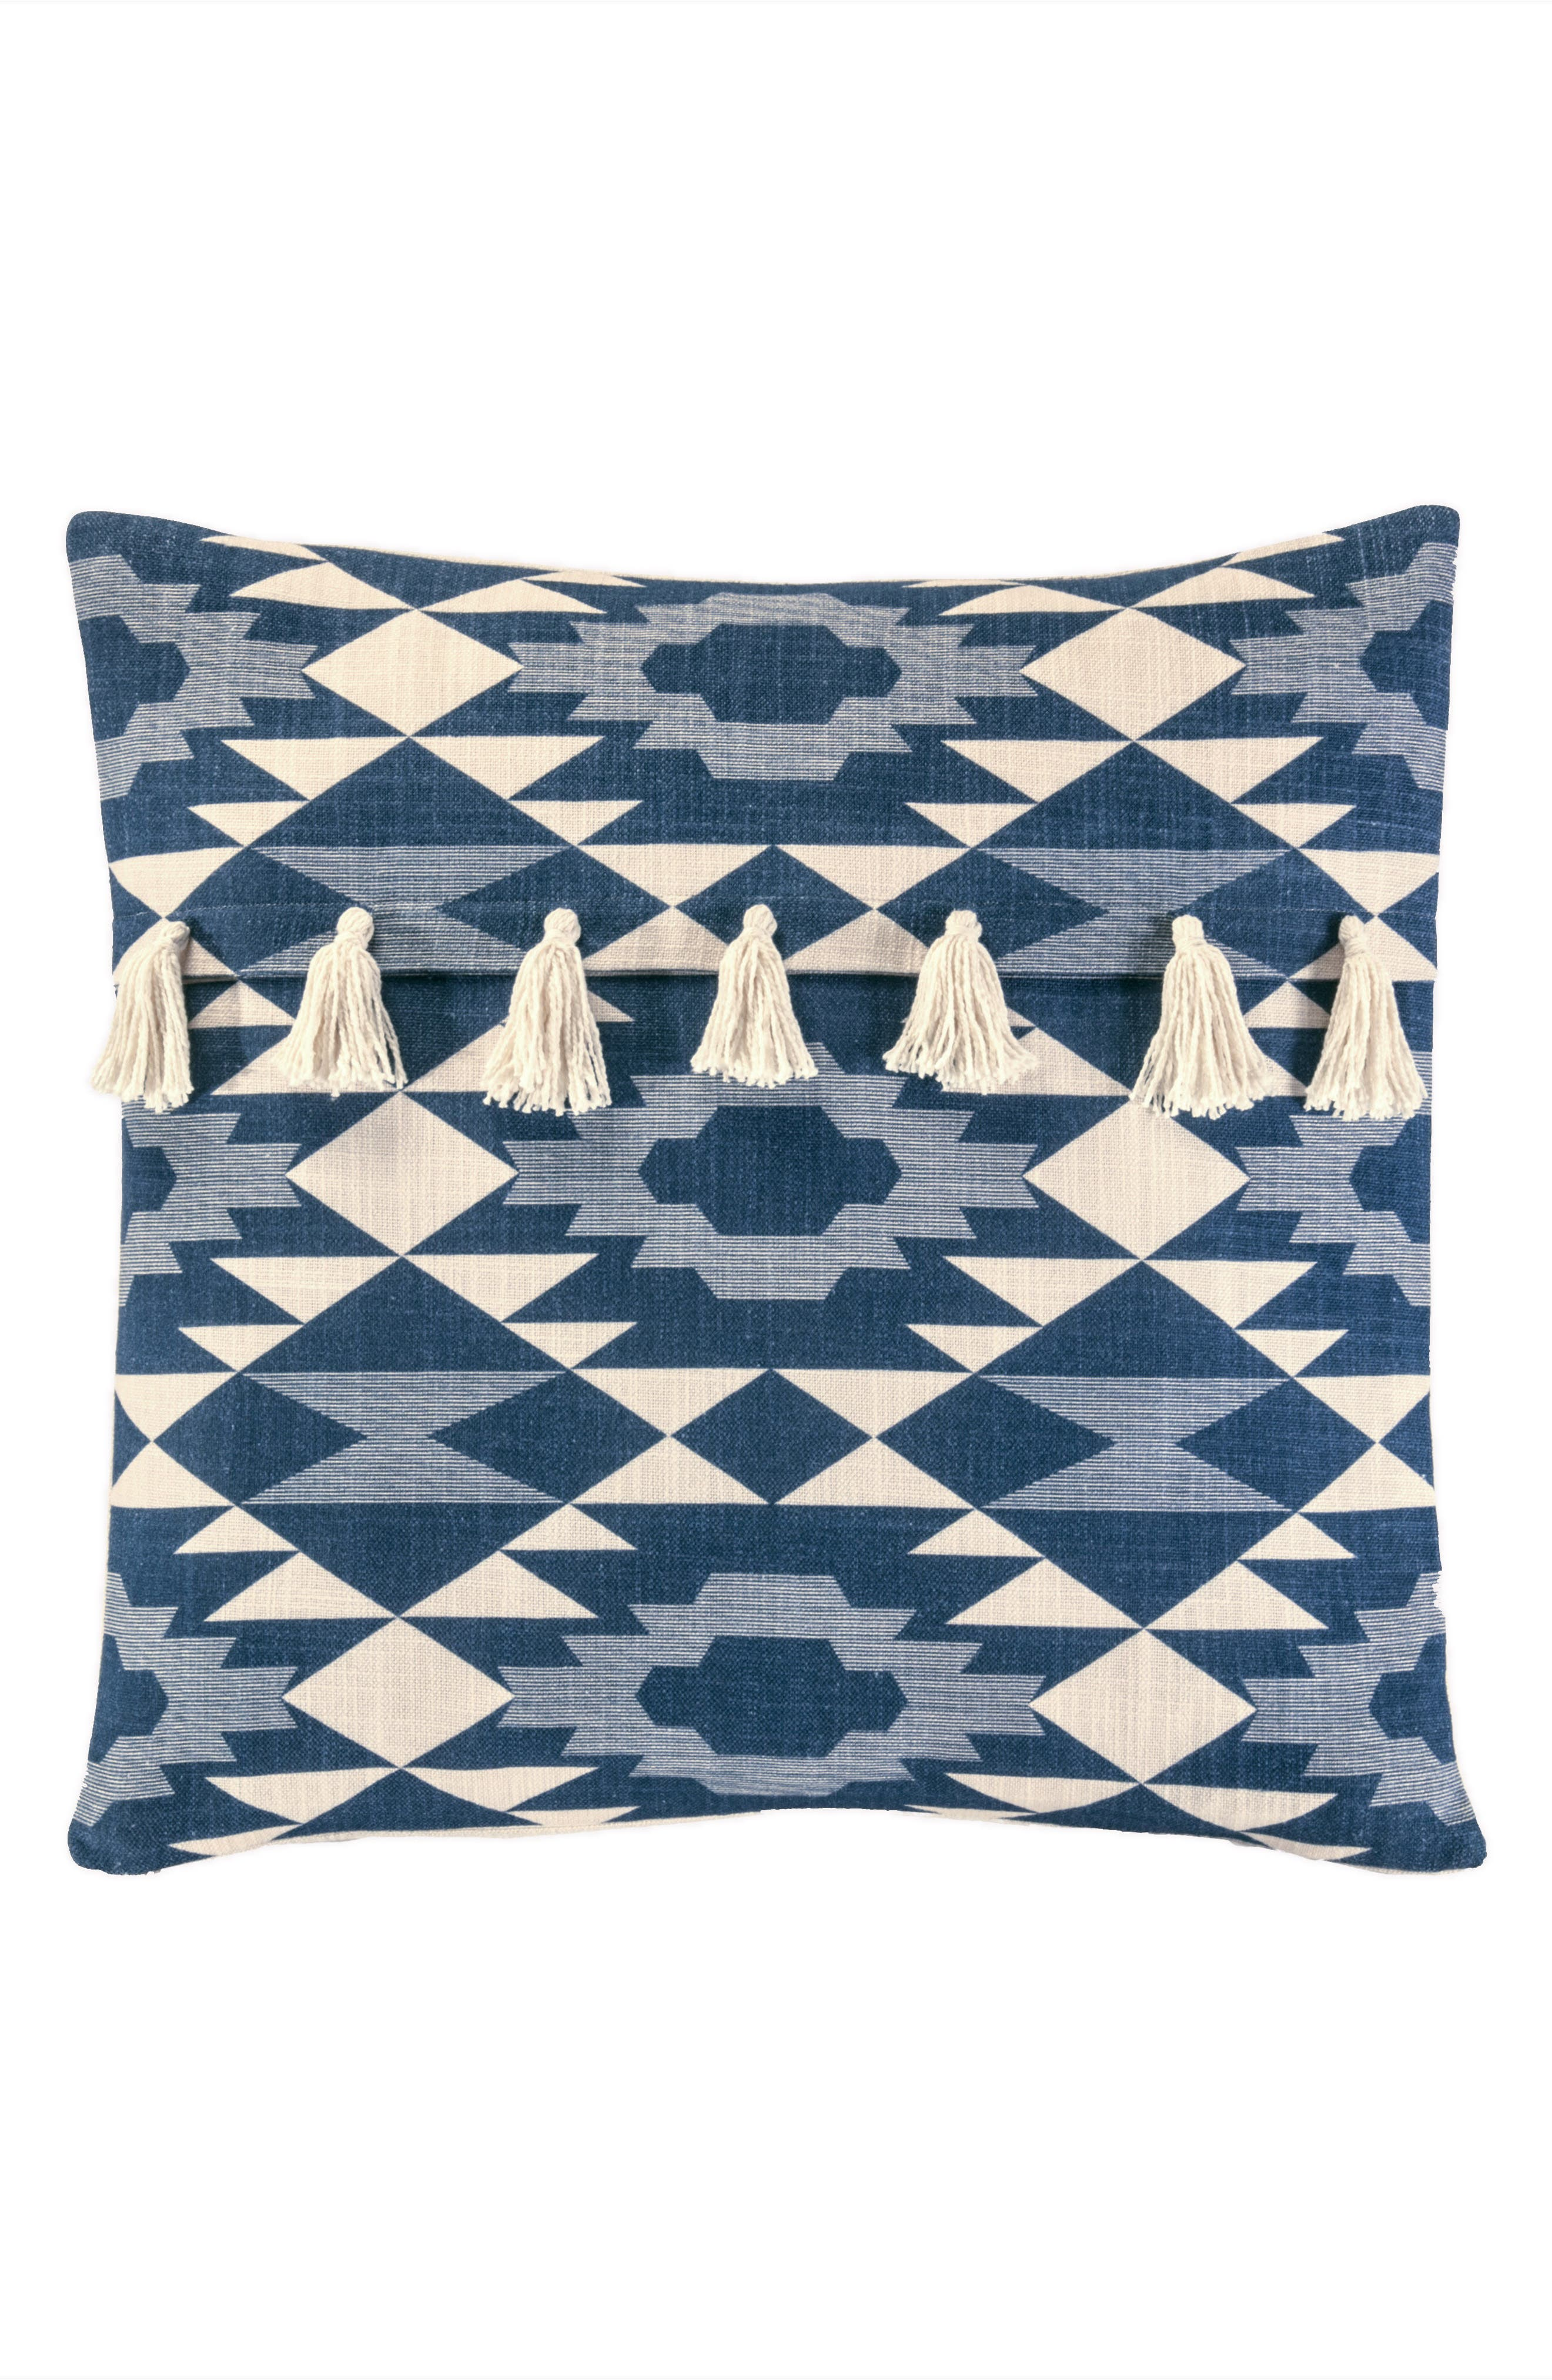 Yuma Star Printed Tassel Accent Pillow,                         Main,                         color, BLUE